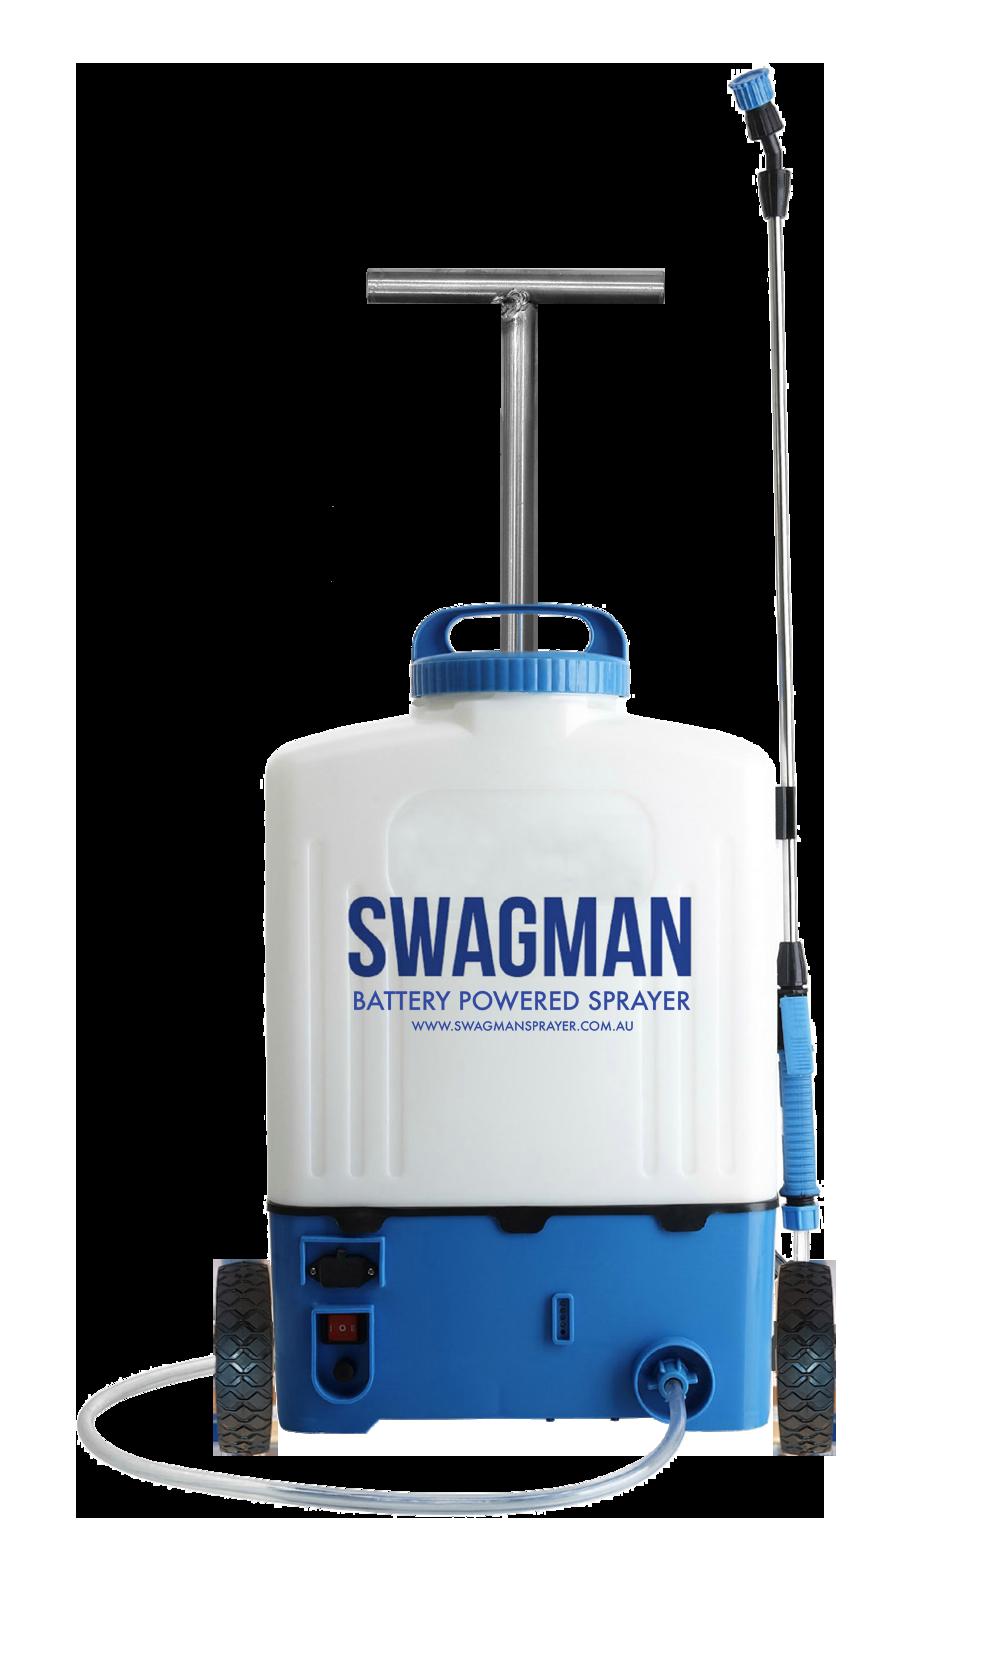 Swagman Sprayer - 16ltr No Wheels copy.png